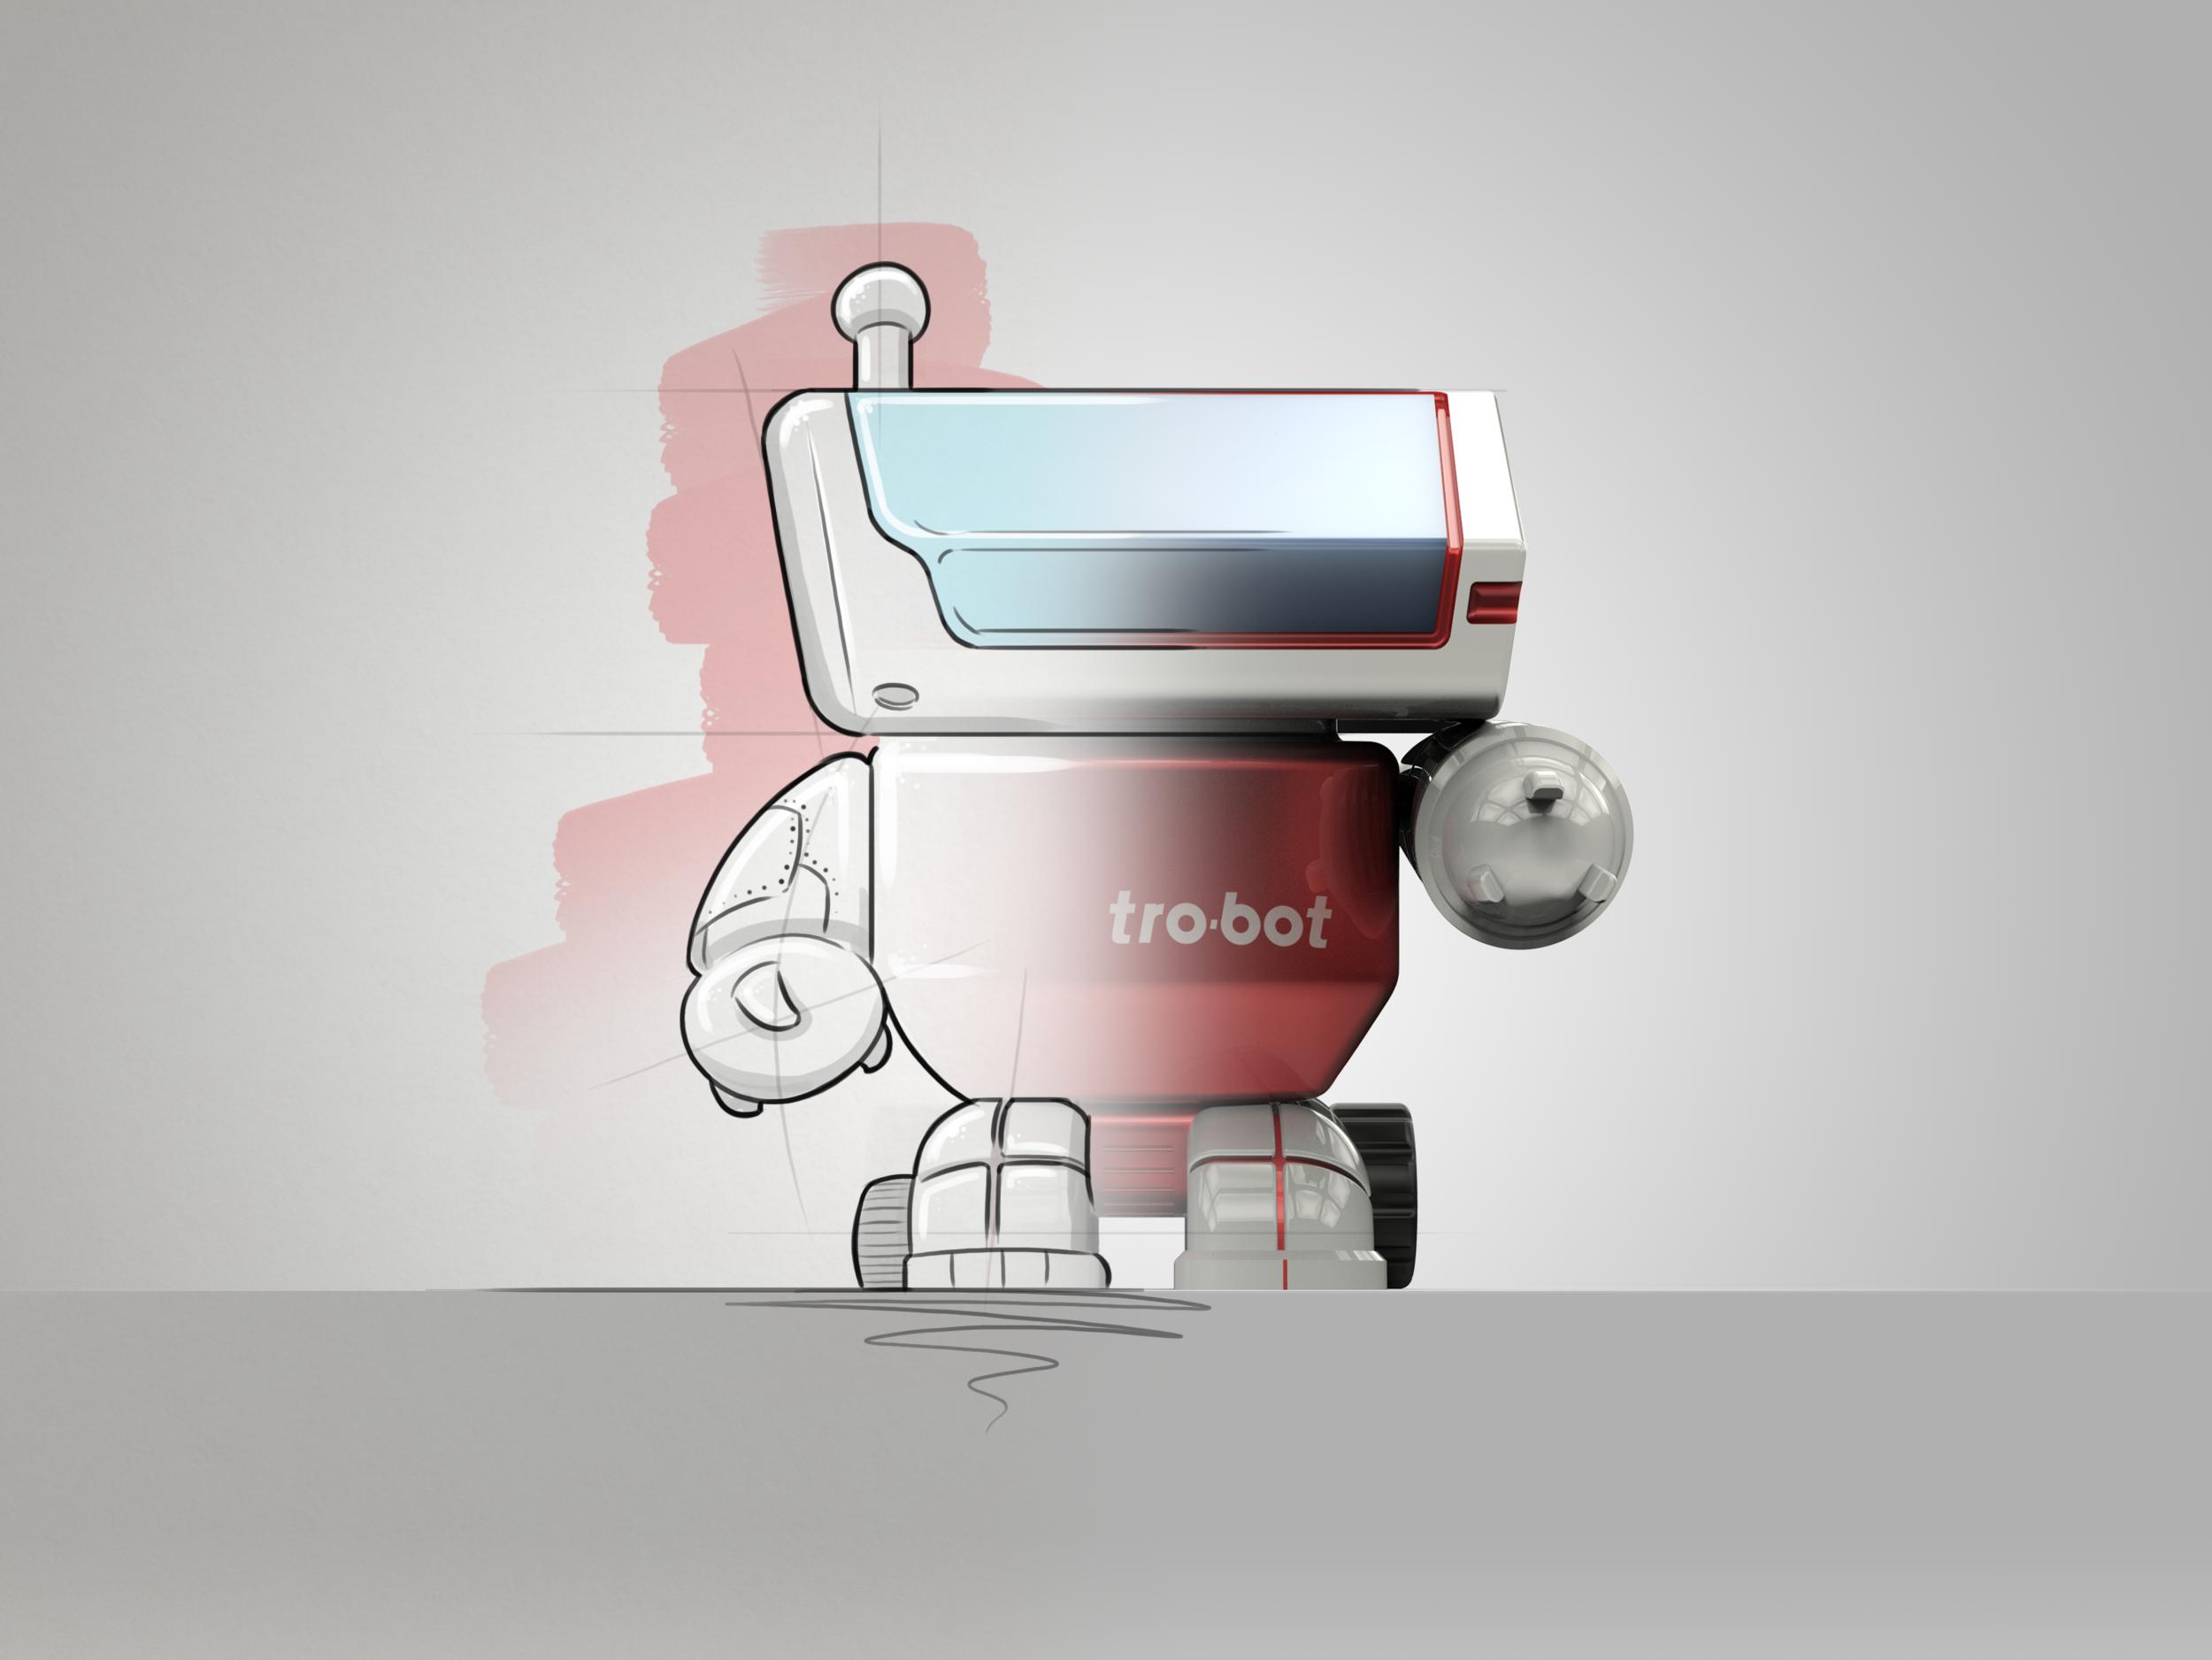 Trotec Trobot Concept Sketch